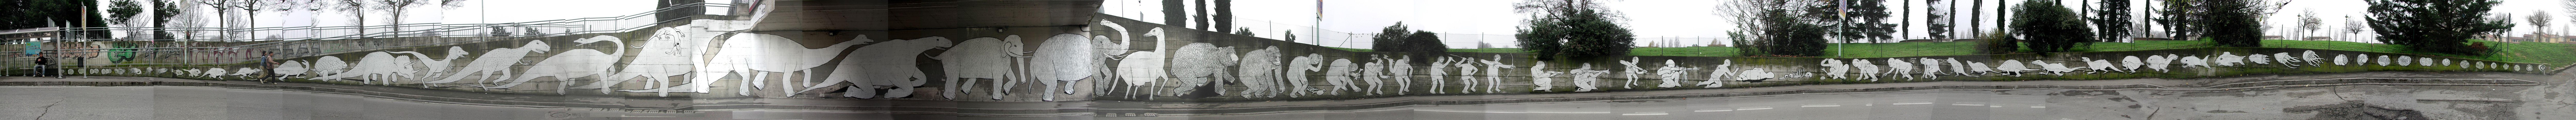 https://i1.wp.com/blublu.org/sito/walls/2007/big/046.jpg